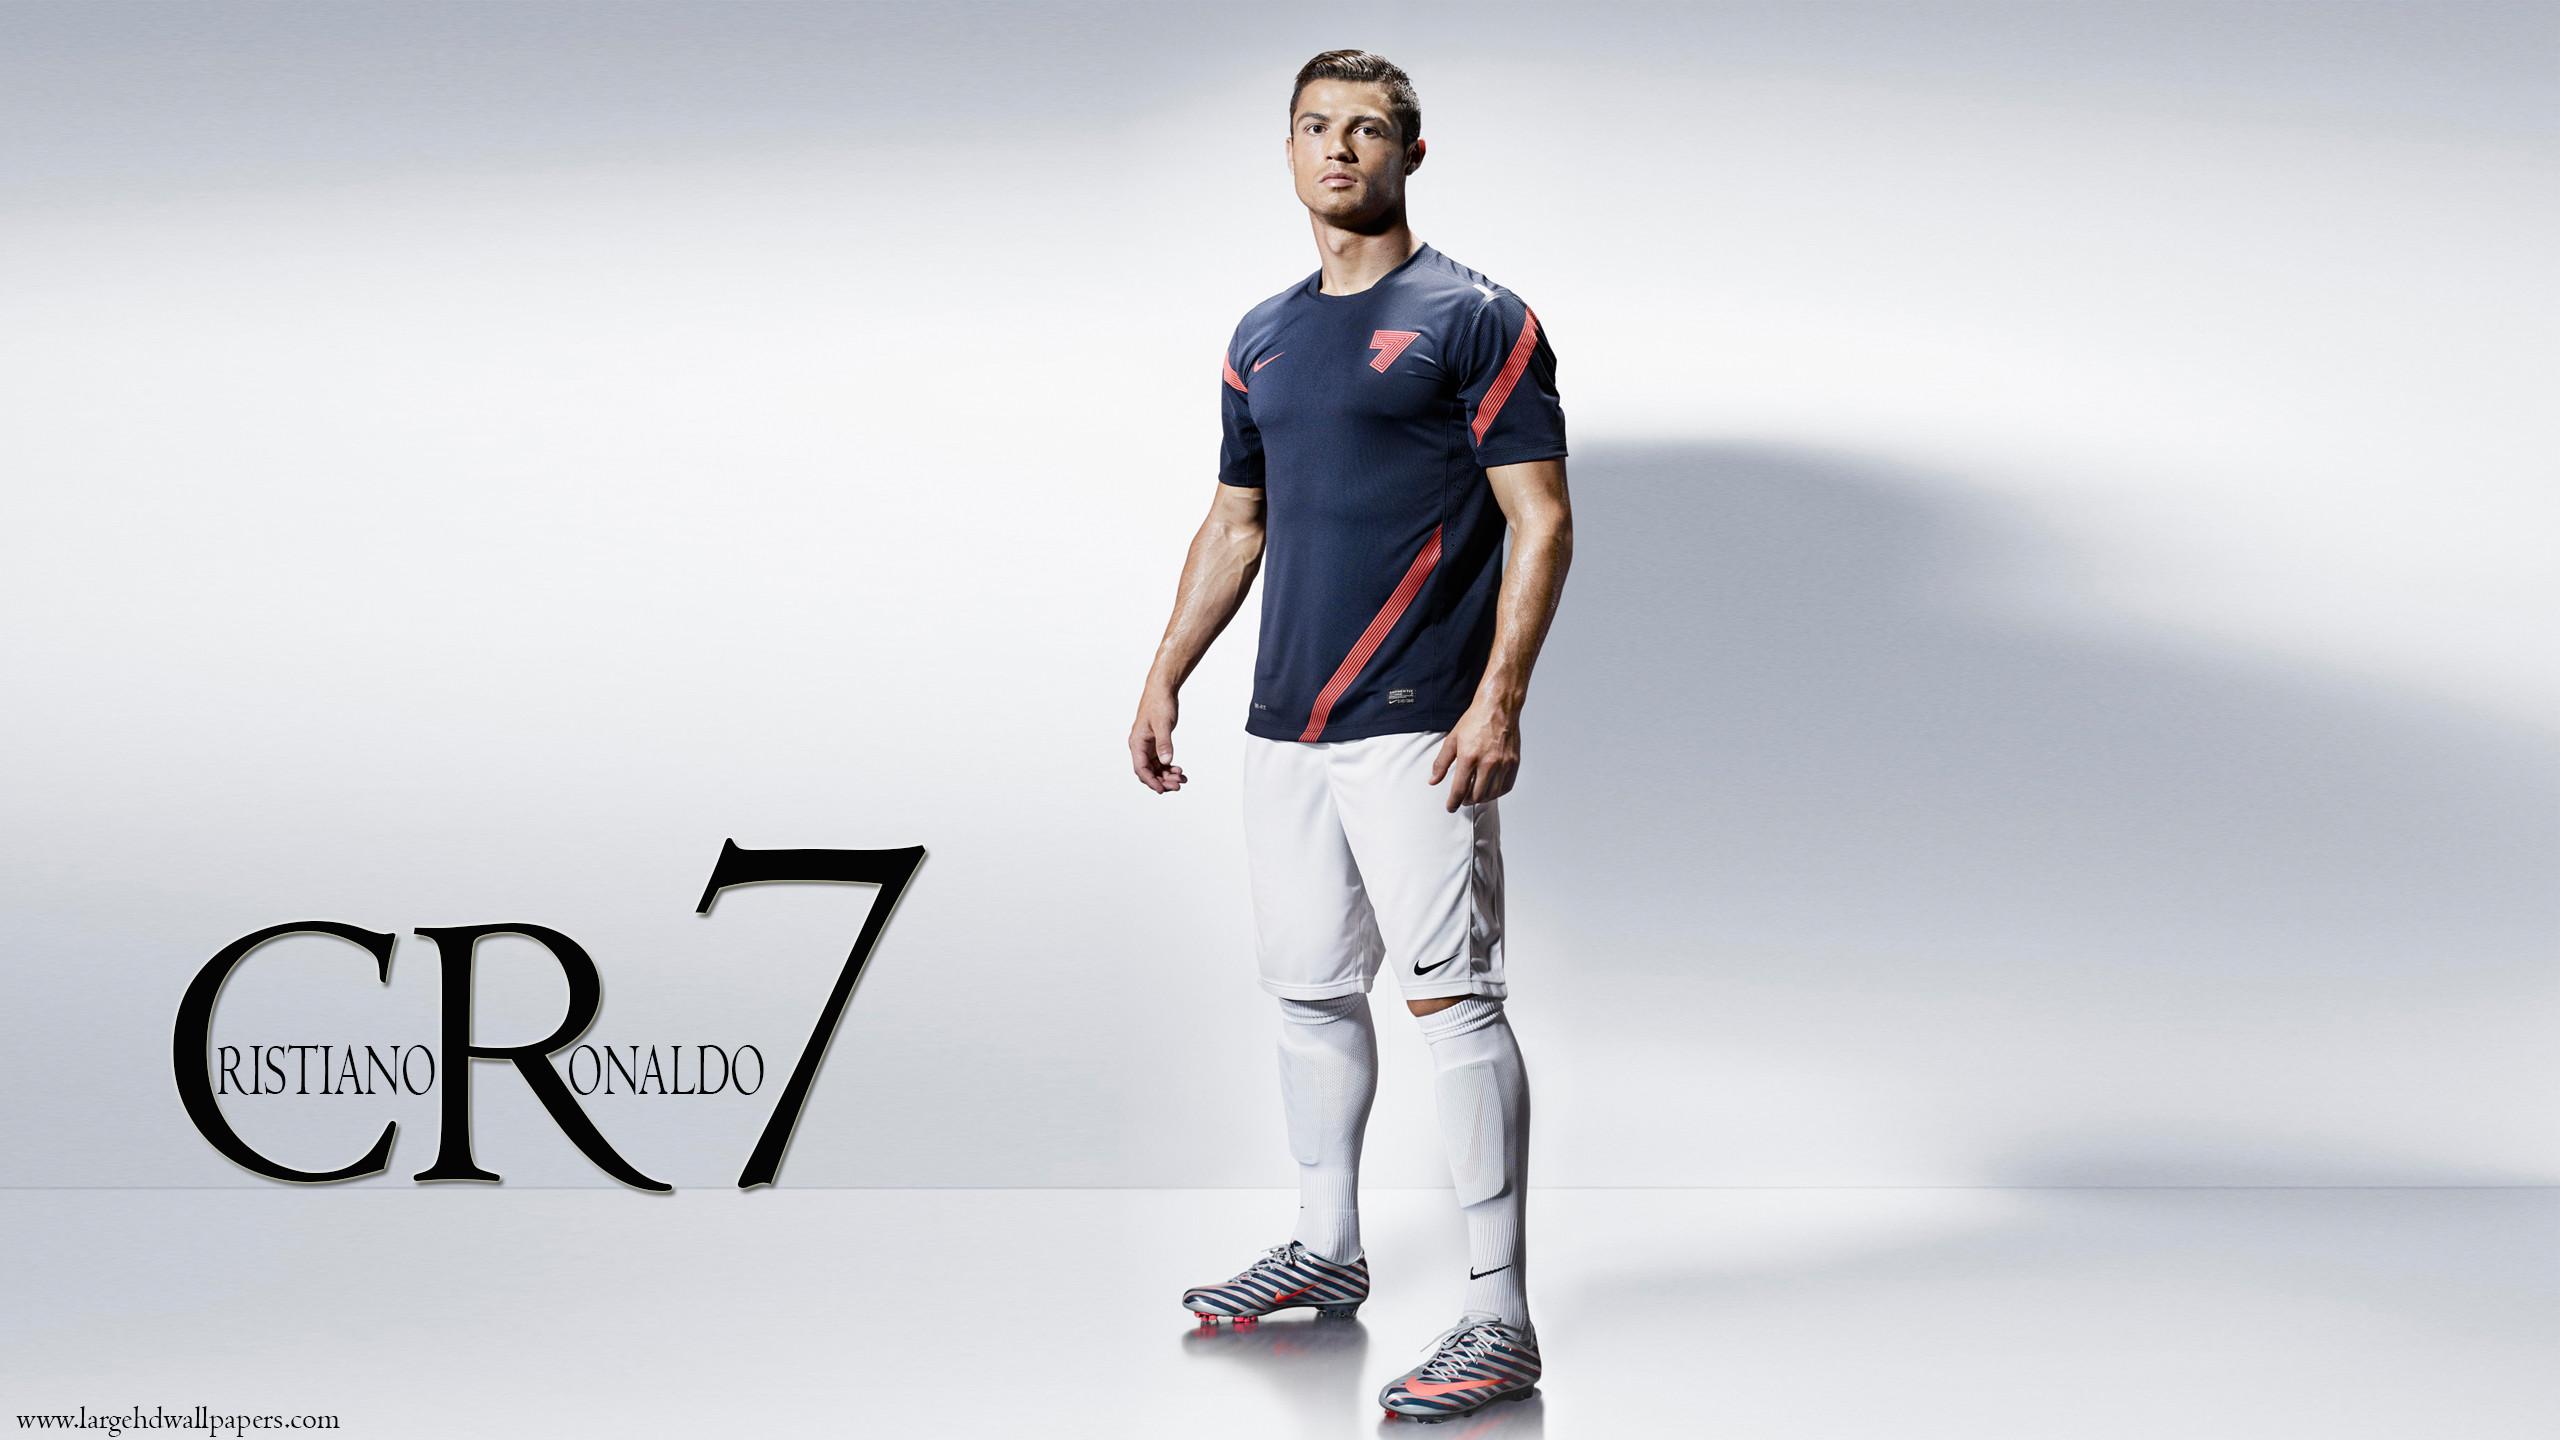 Cristiano Ronaldo Most Popular Football Player HD Wallpapers